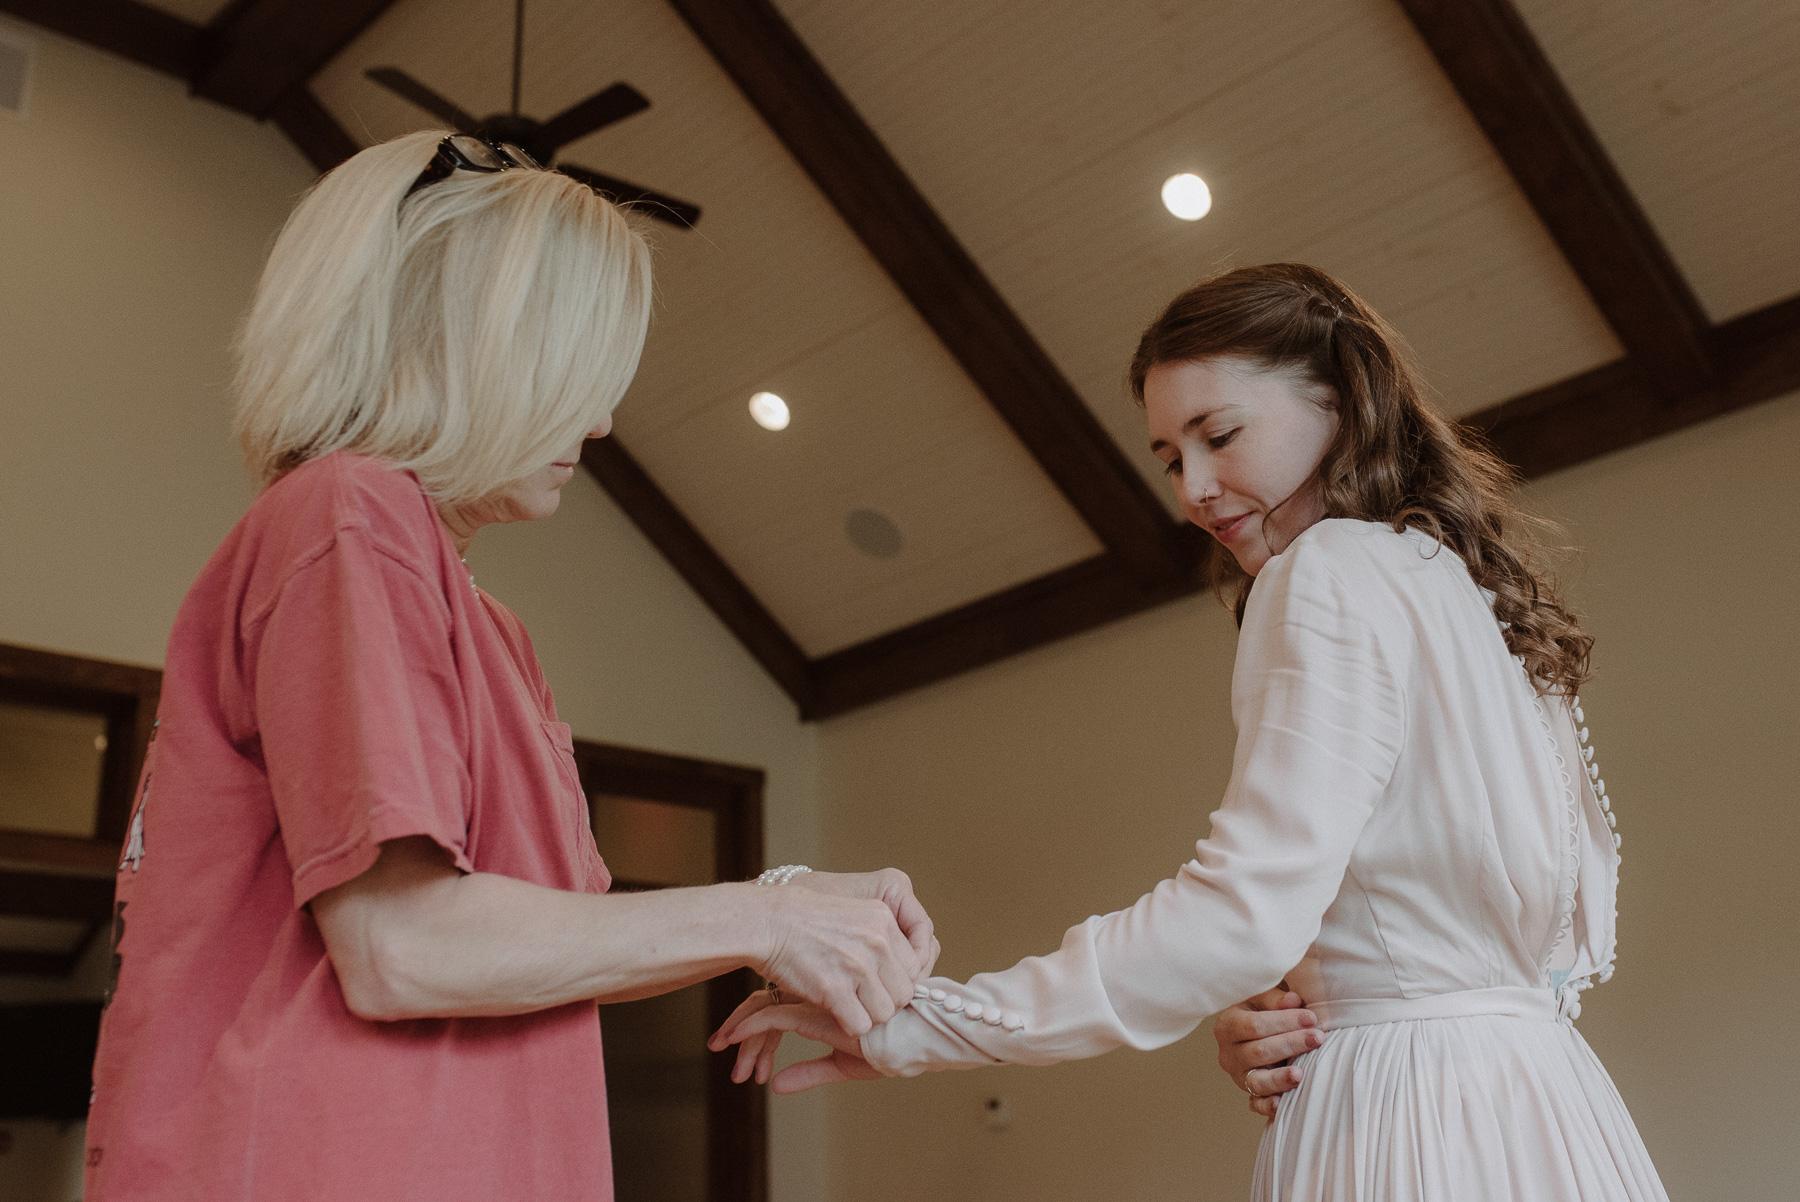 enowen-wedding-photography-linville-nc-carson-john-elopement (13 of 109).jpg